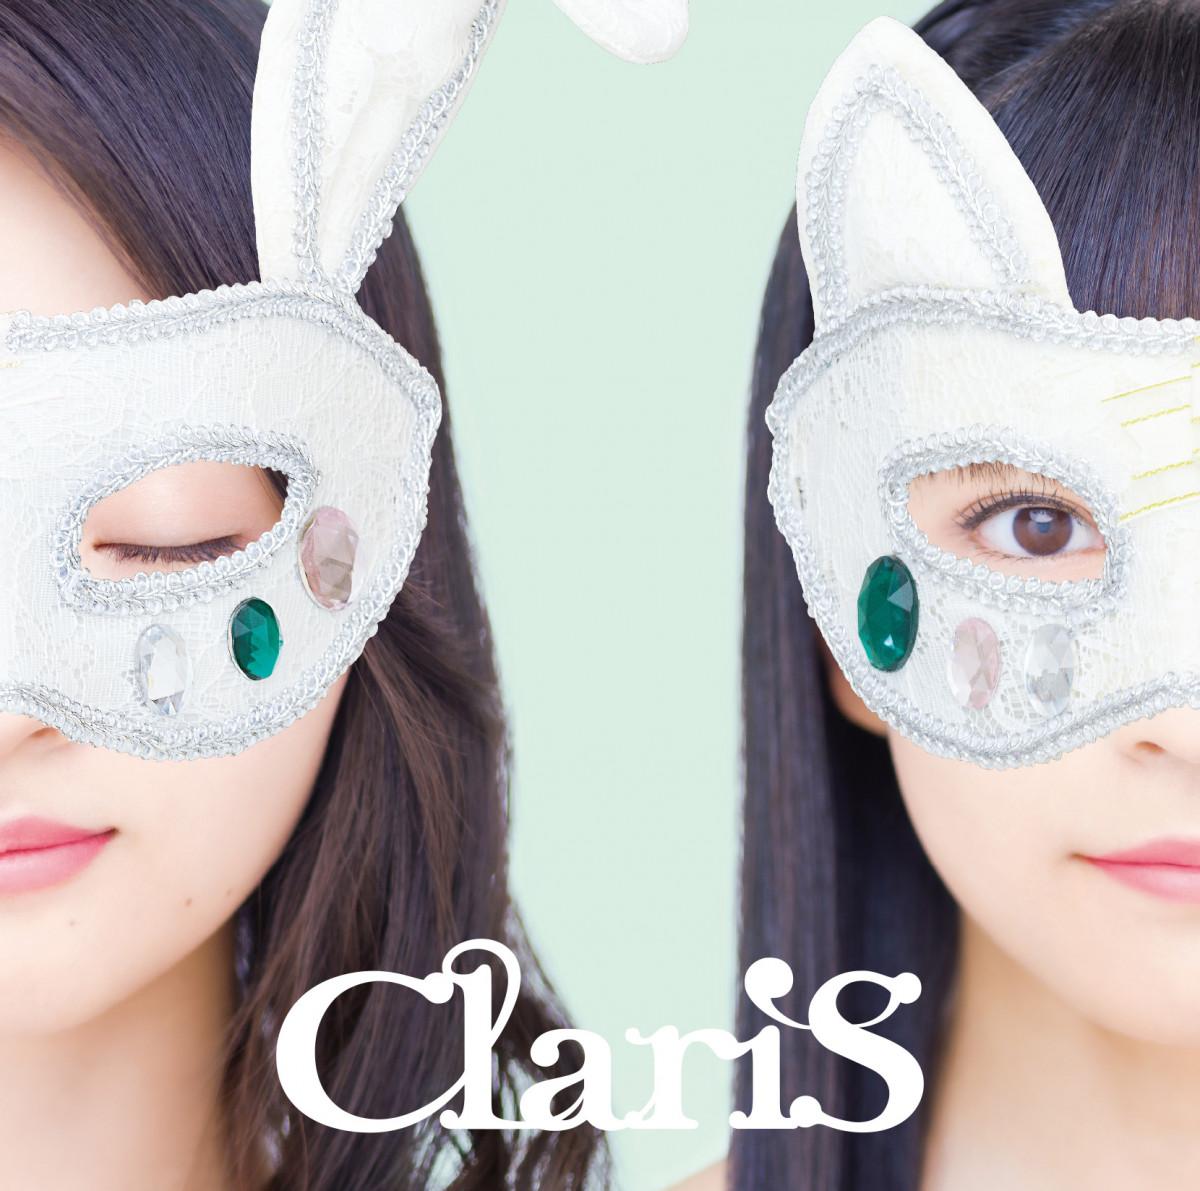 ClariS 10周年紀念線上演唱會:放下面具 首次向媒體公開真實樣貌